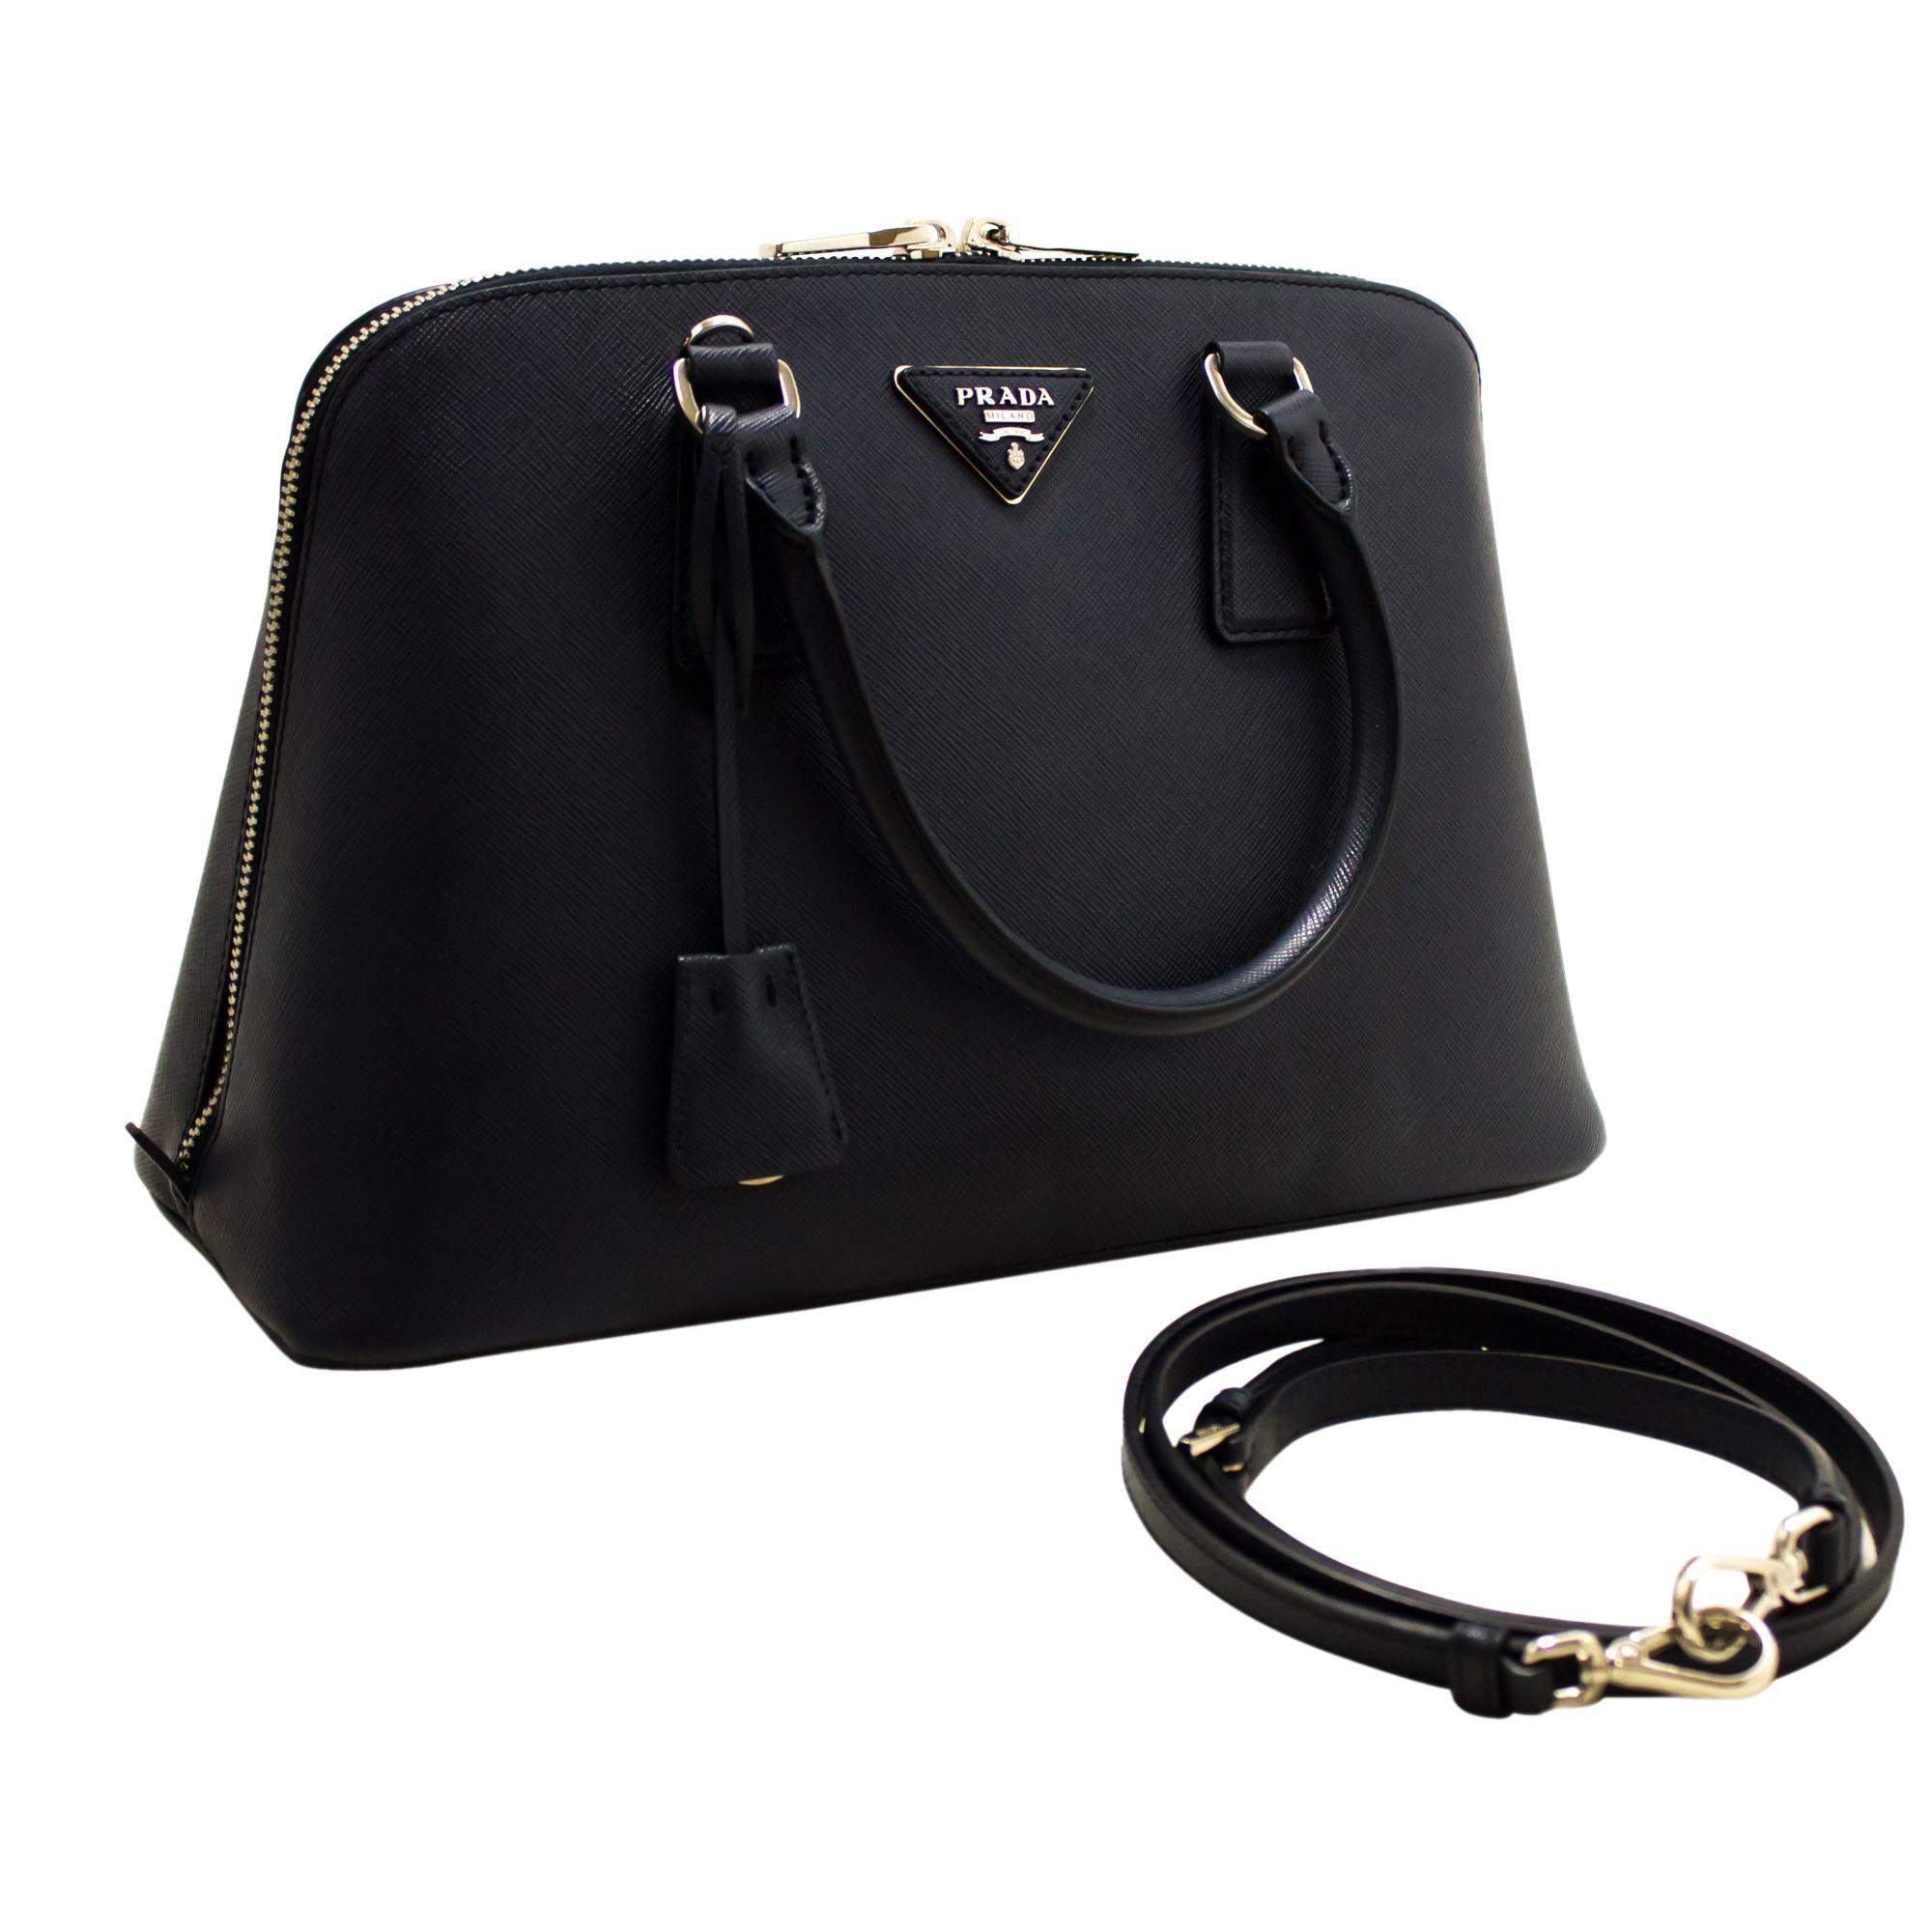 5eaae4081e69e PRADA Saffiano Lux Shoulder Bag Handbag Navy Leather Strap Silver